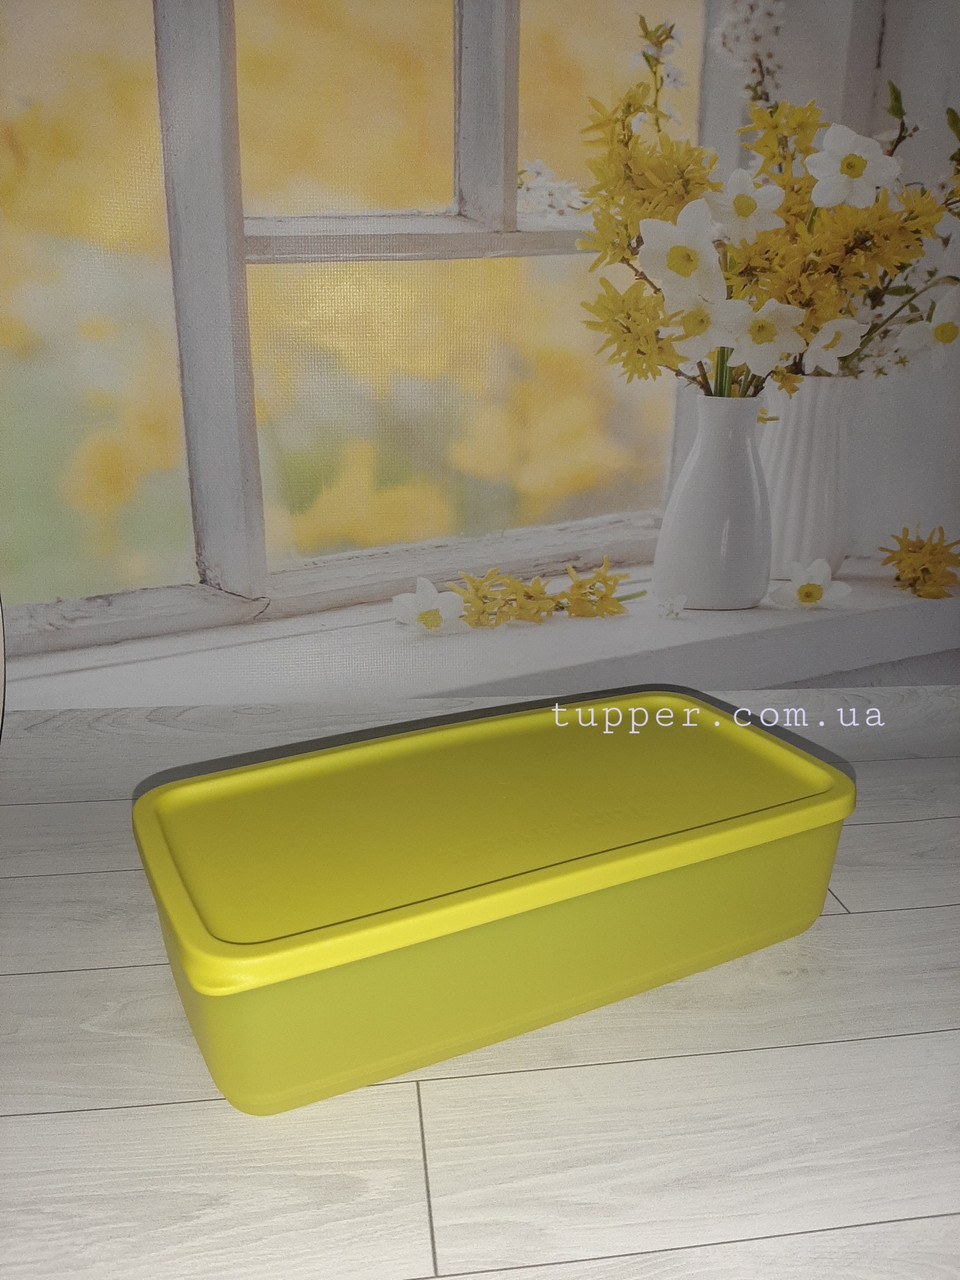 Контейнер Кубикс 1,4 л Tupperware 1шт лимонный